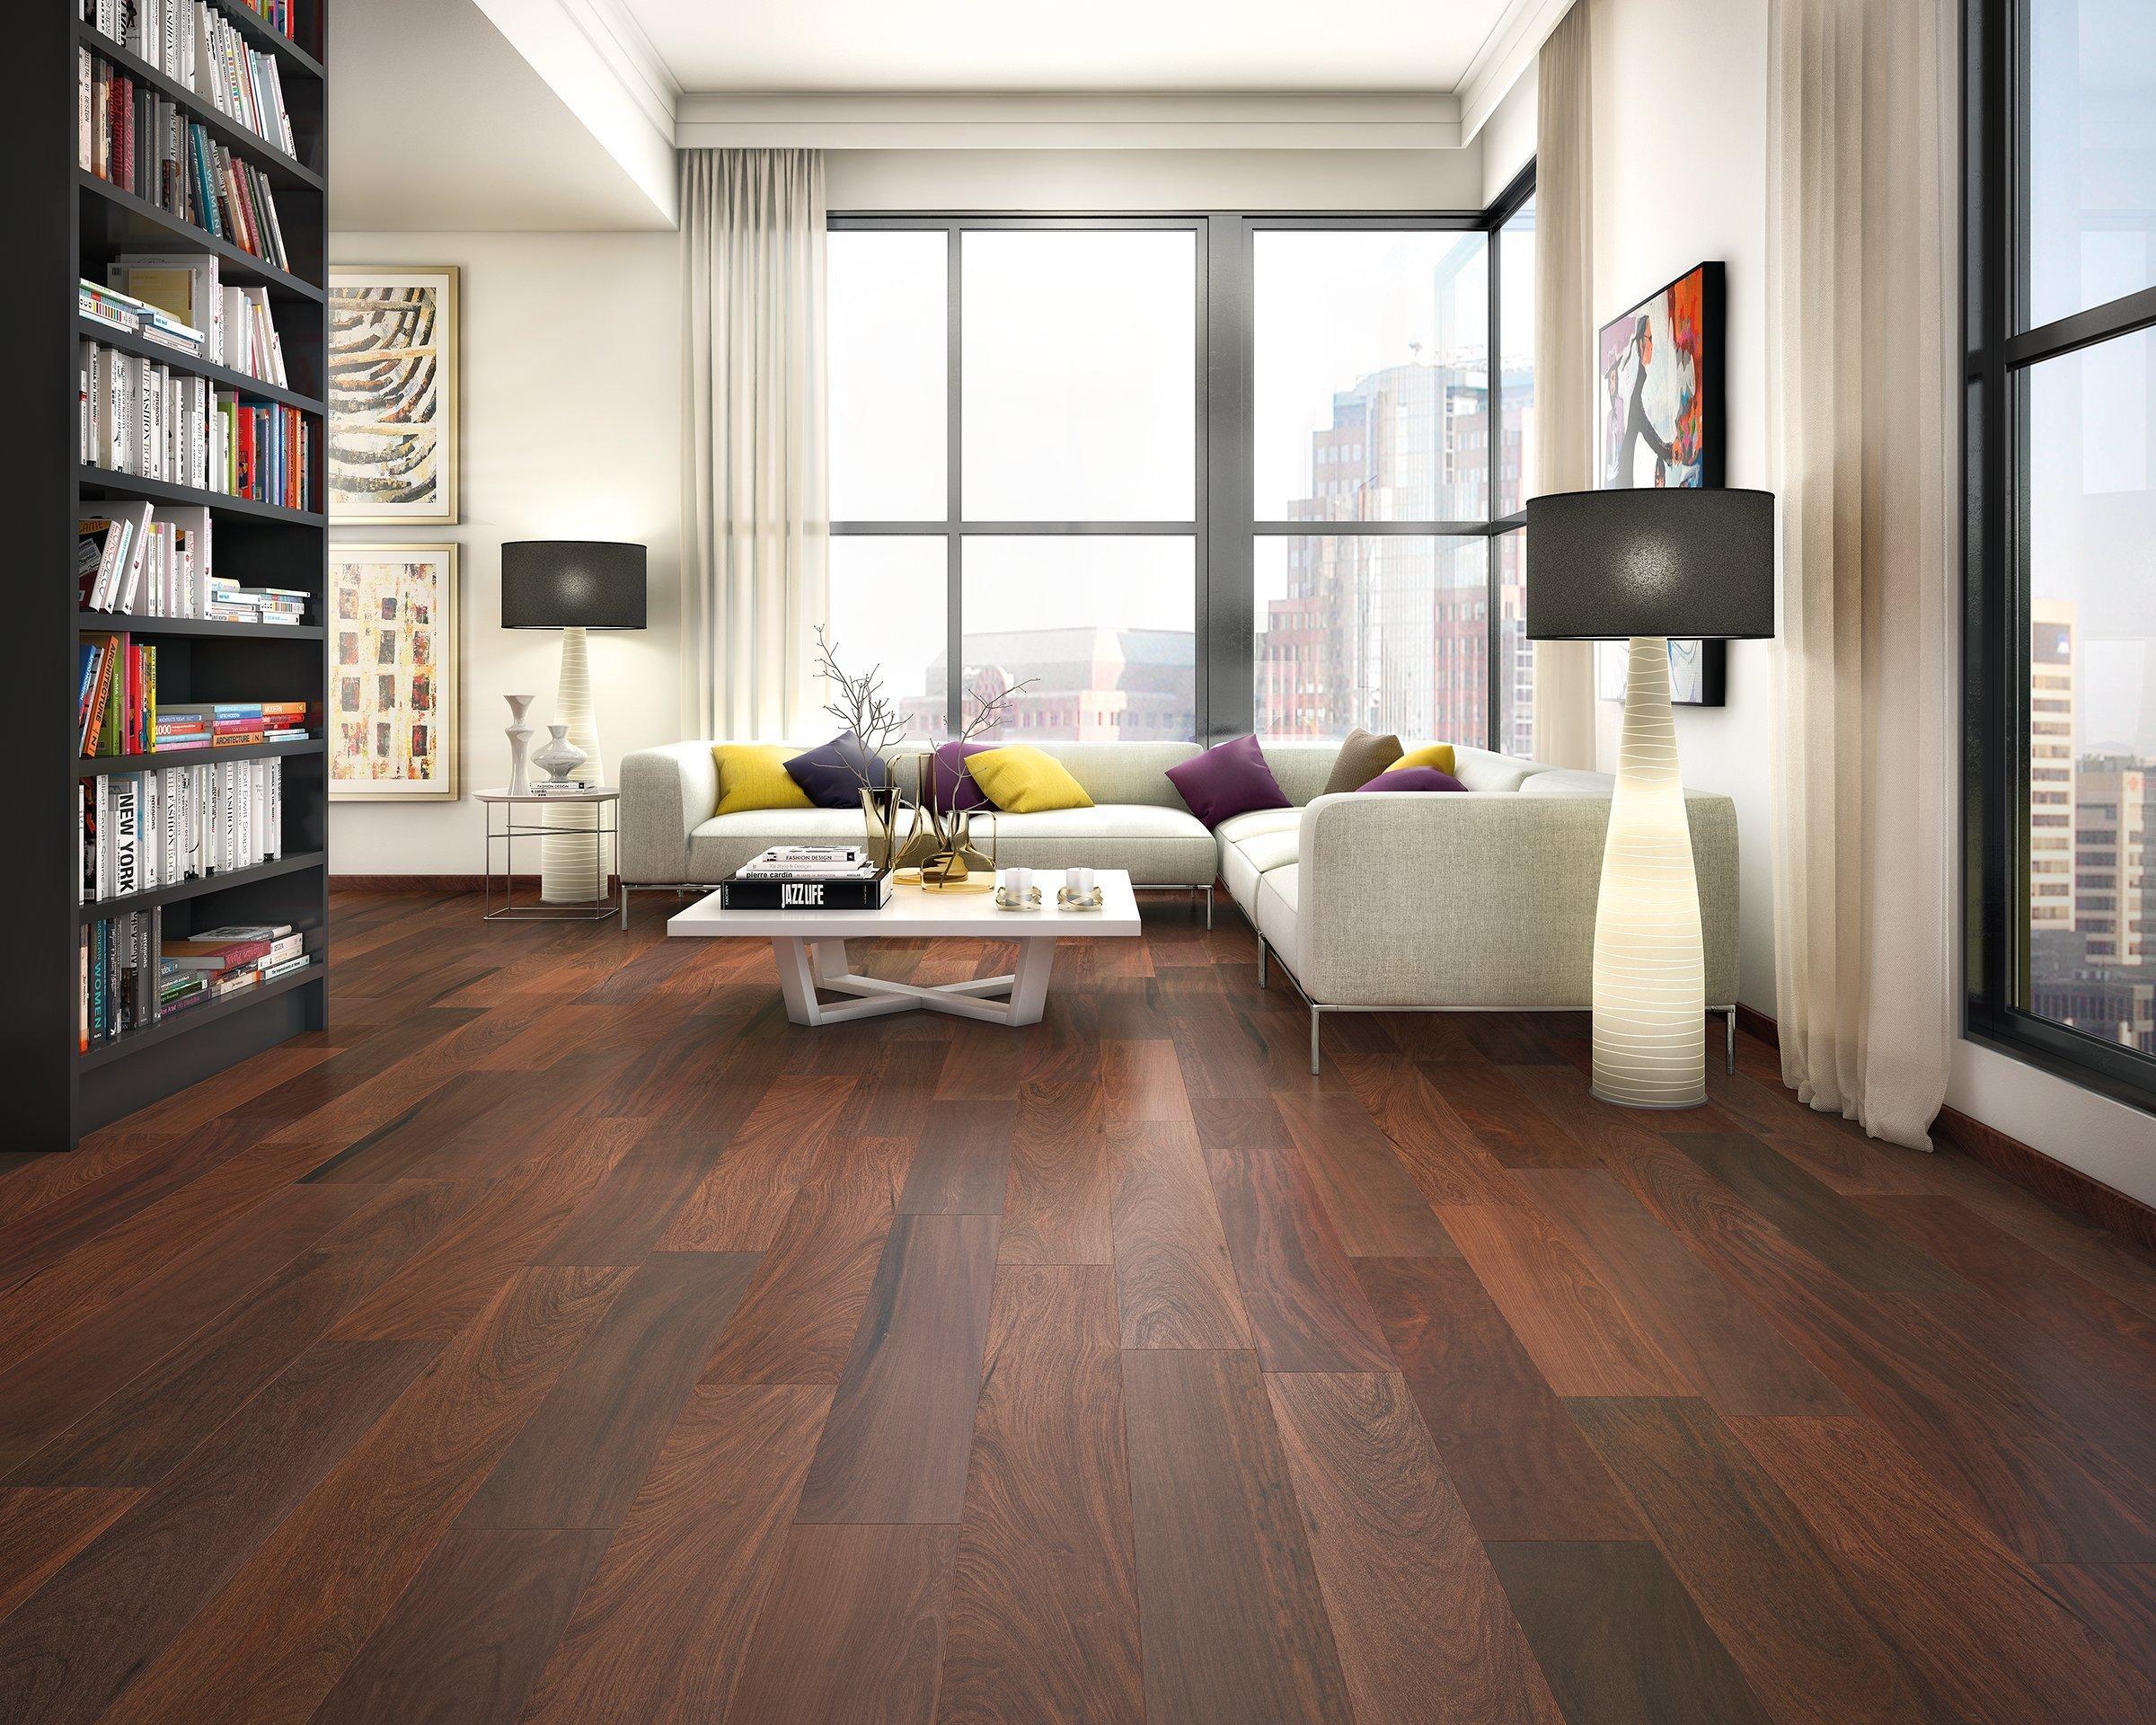 flooring with hardwood menifee walnut gallery cherry ca stain photo special rj floors call brazilian